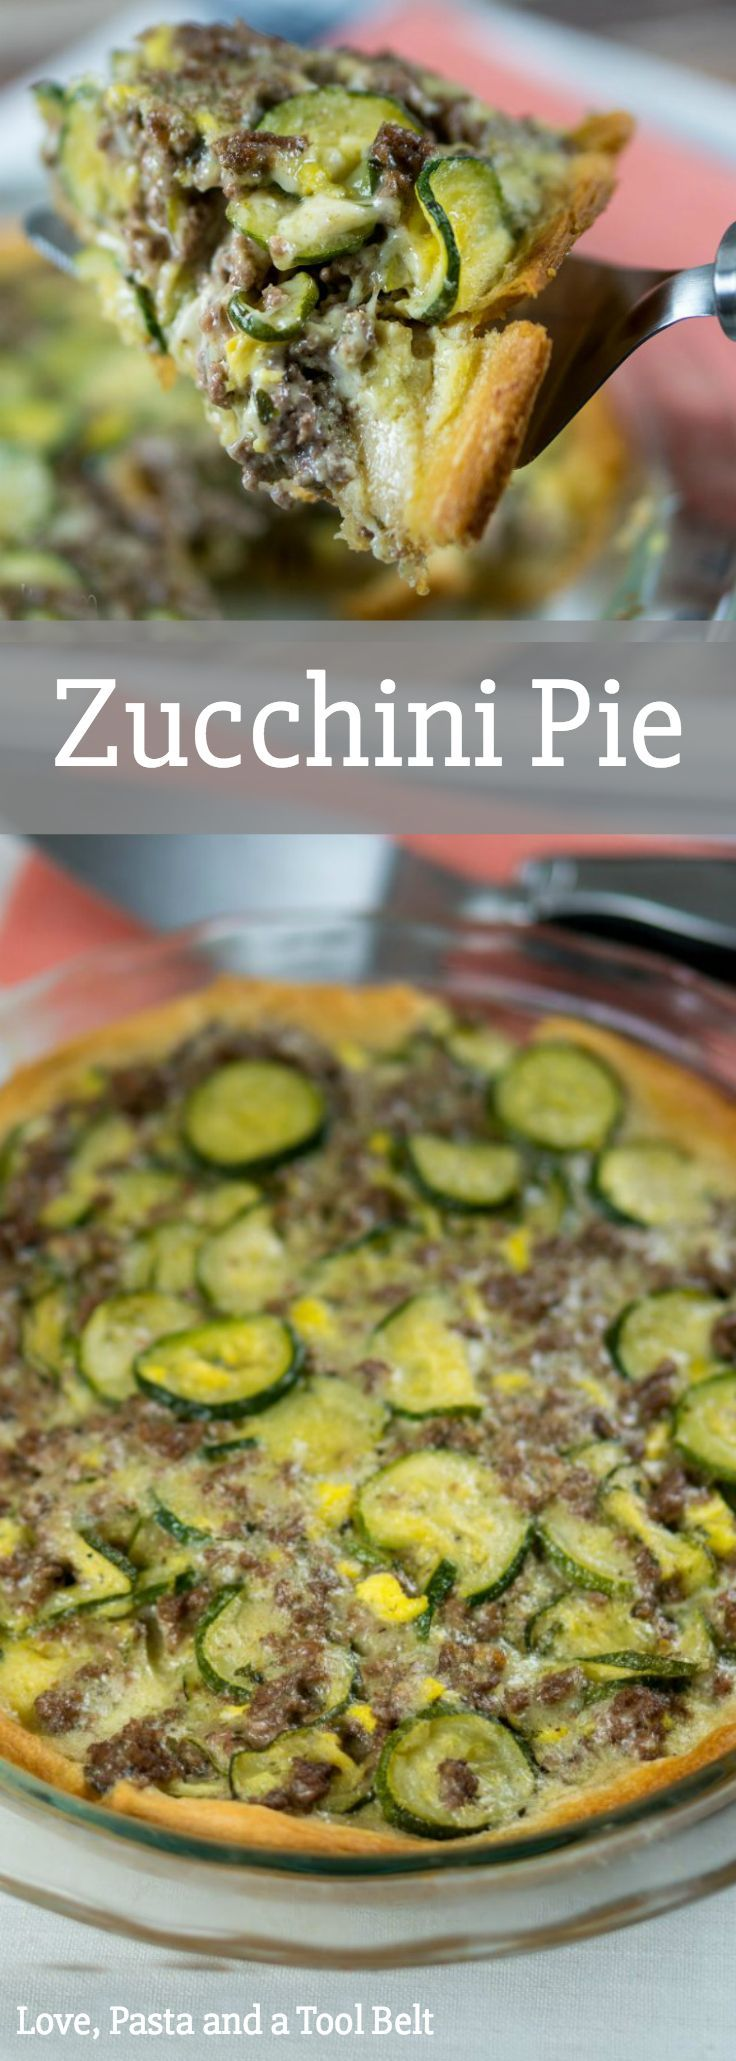 Zucchini Pie - recipes | dinner | ground beef | mozzarella cheese | crescent rolls | main dish | zucchini recipe | pie |  via @LovePastaBlog